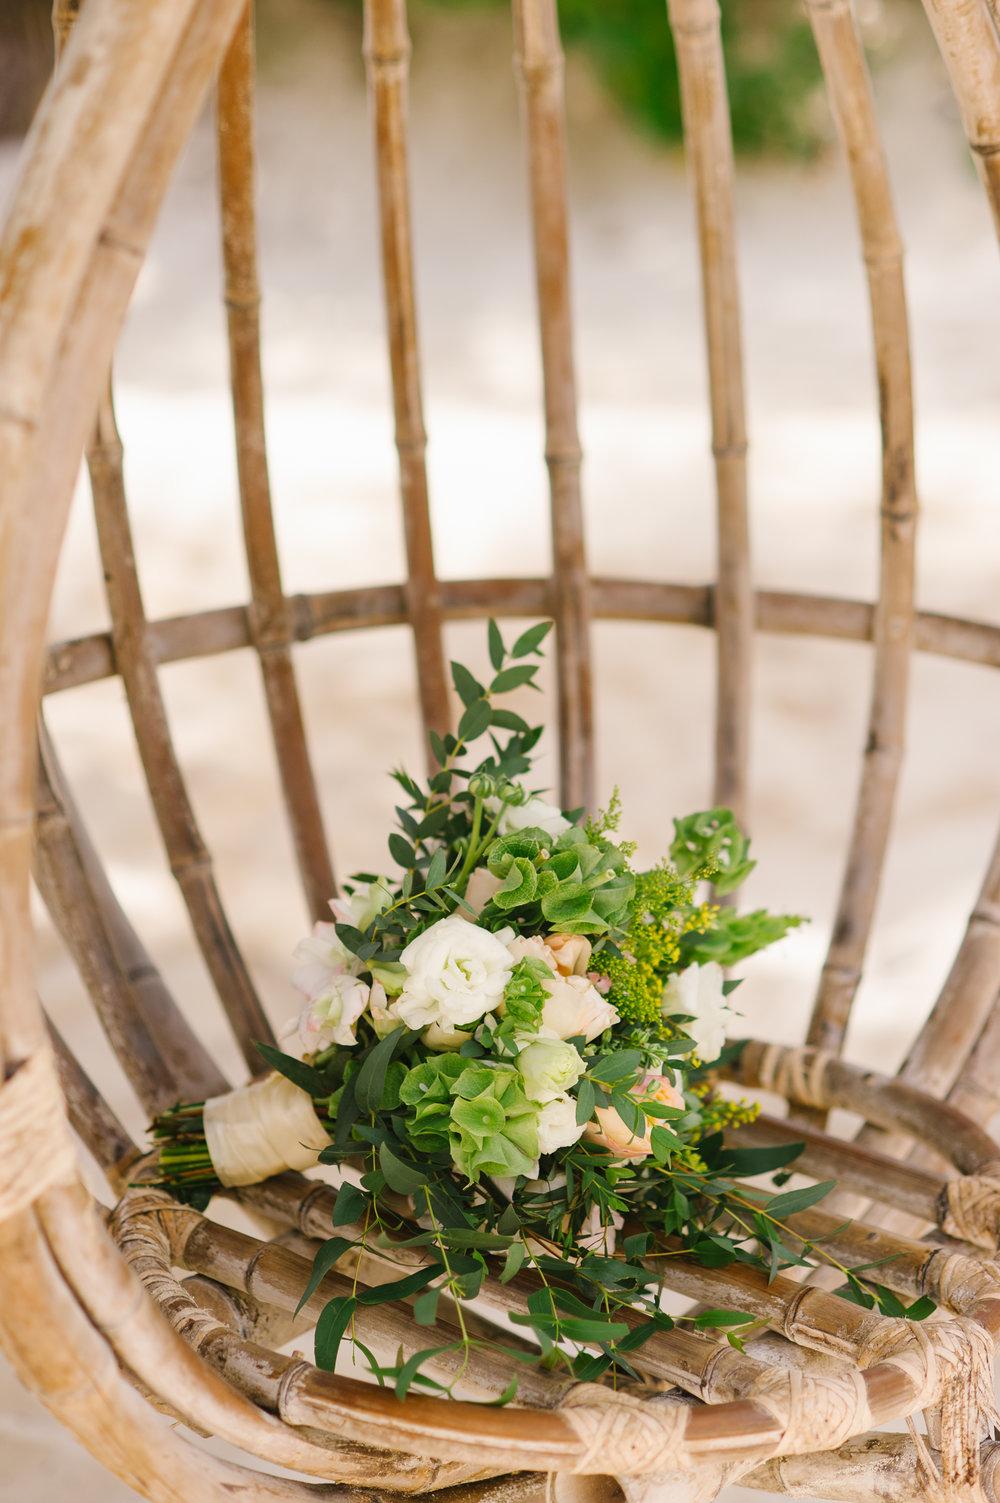 Rustic Wedding Bouquet - www.theeventeur.com/blog